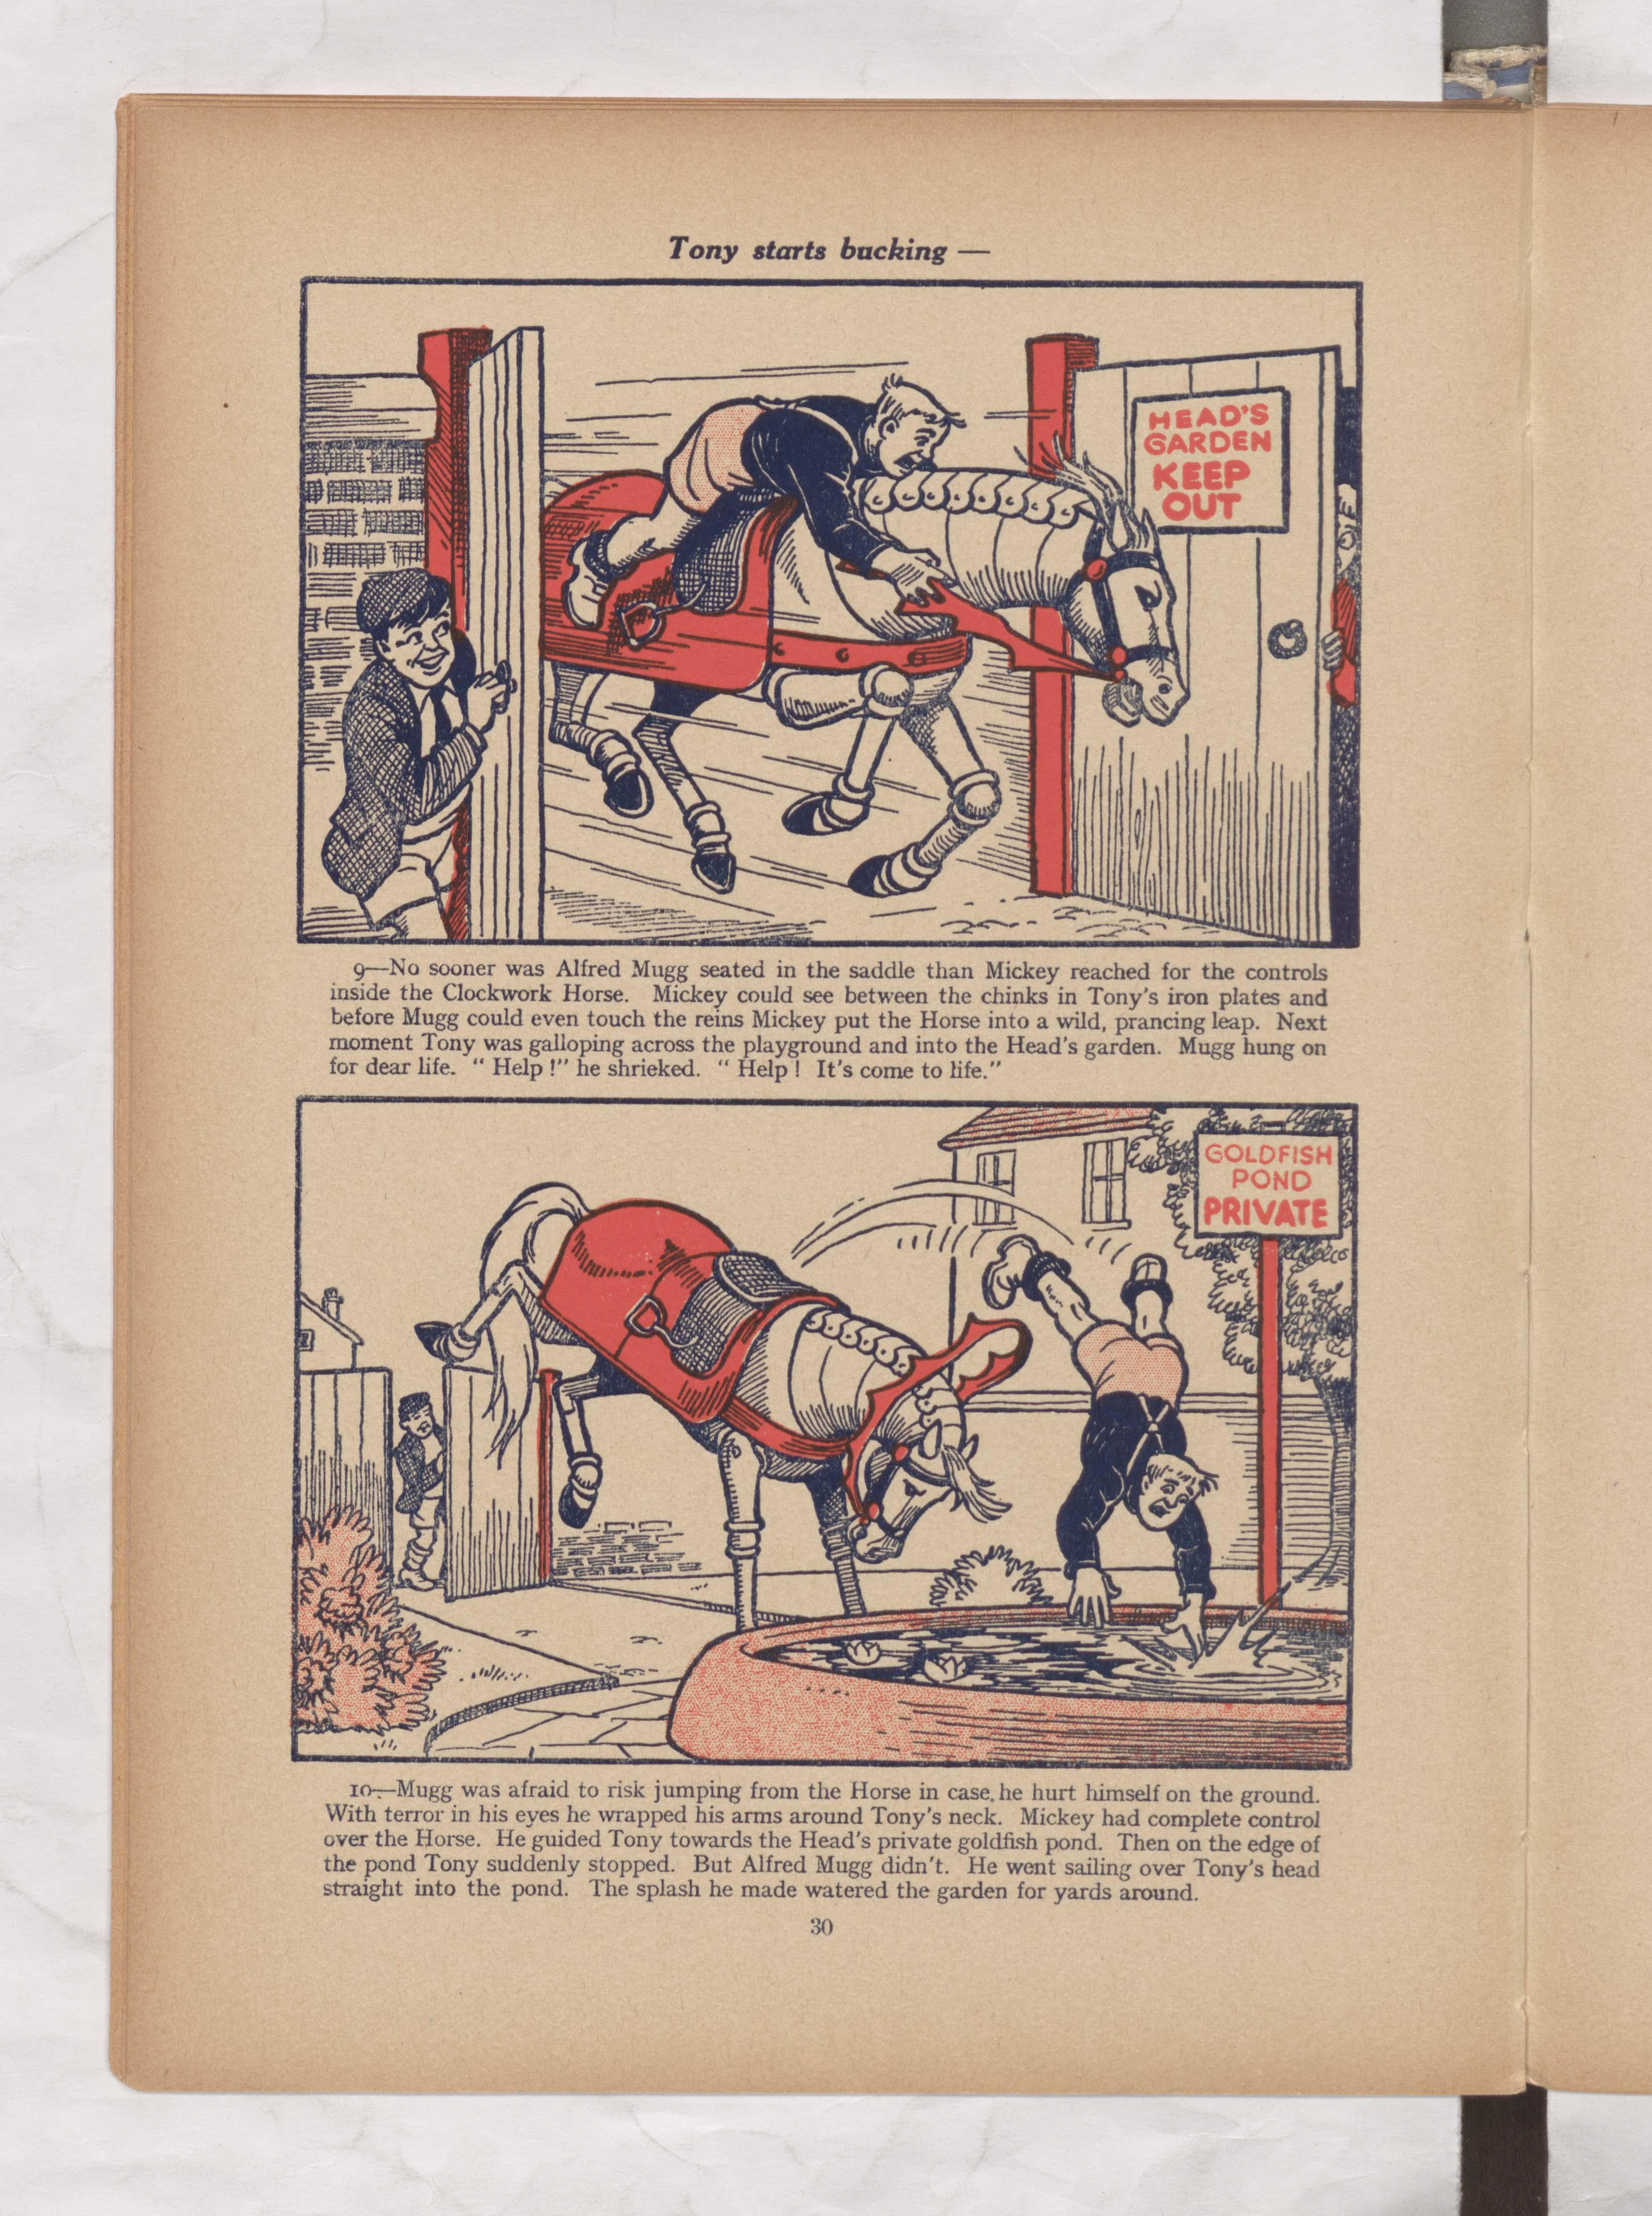 tick tock tony beano book 1952 annual